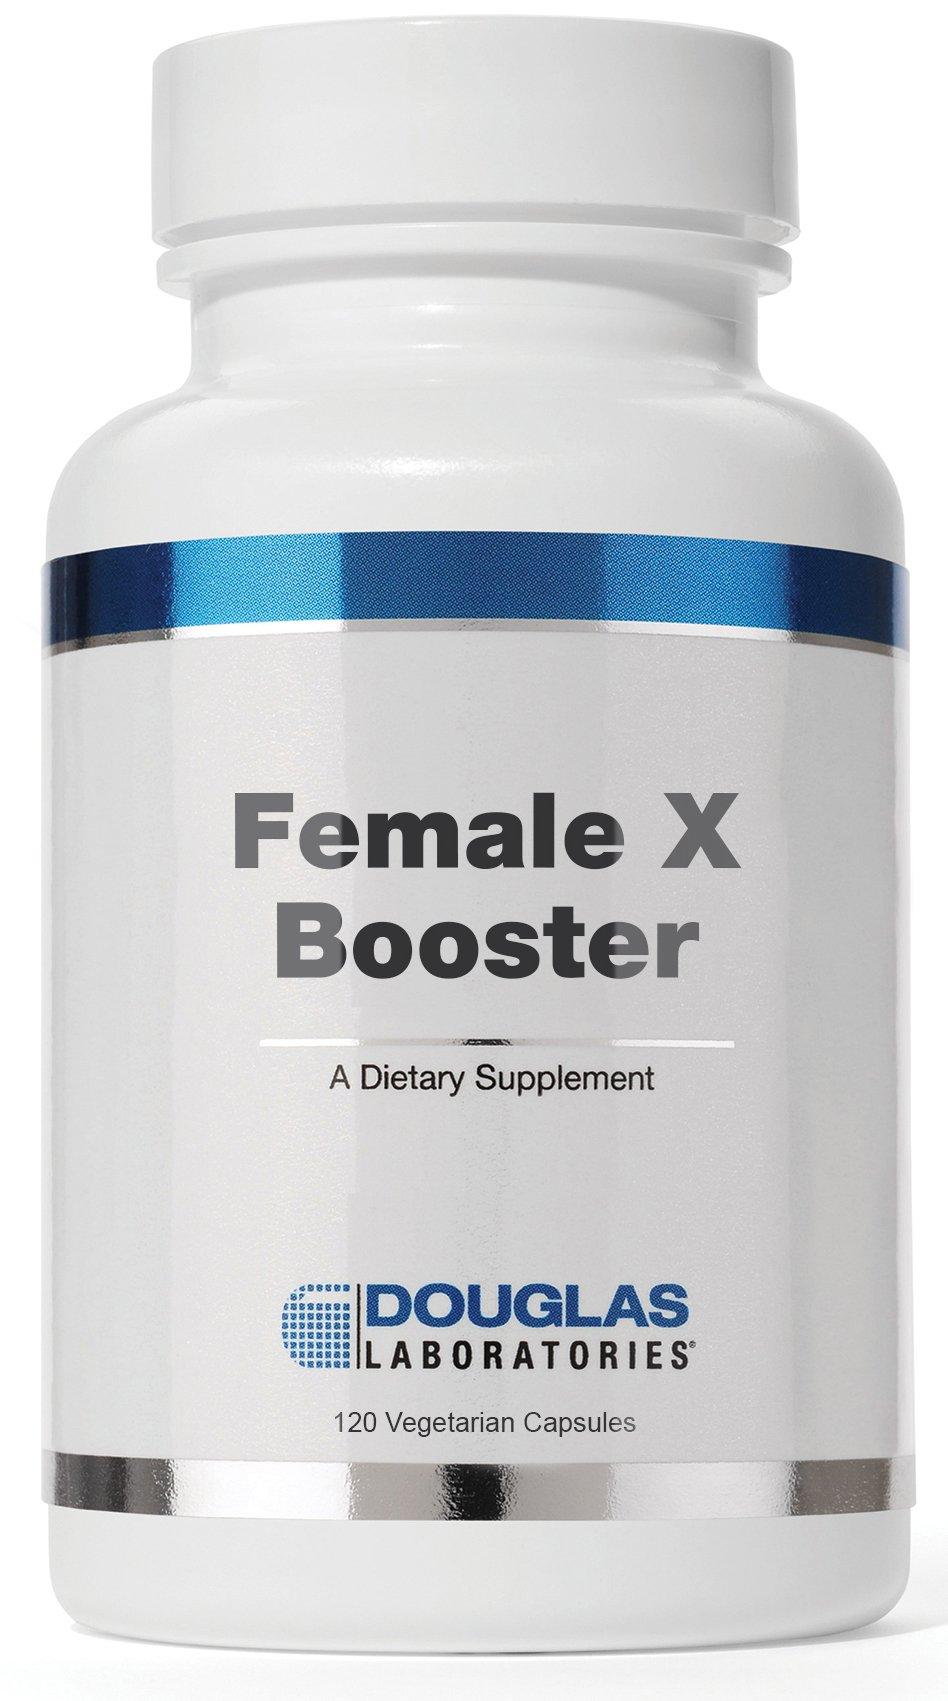 Douglas Laboratories® - Female X Booster - Adaptagens with L-Arginine and L-Citrulline to Support Libido - 120 Capsules